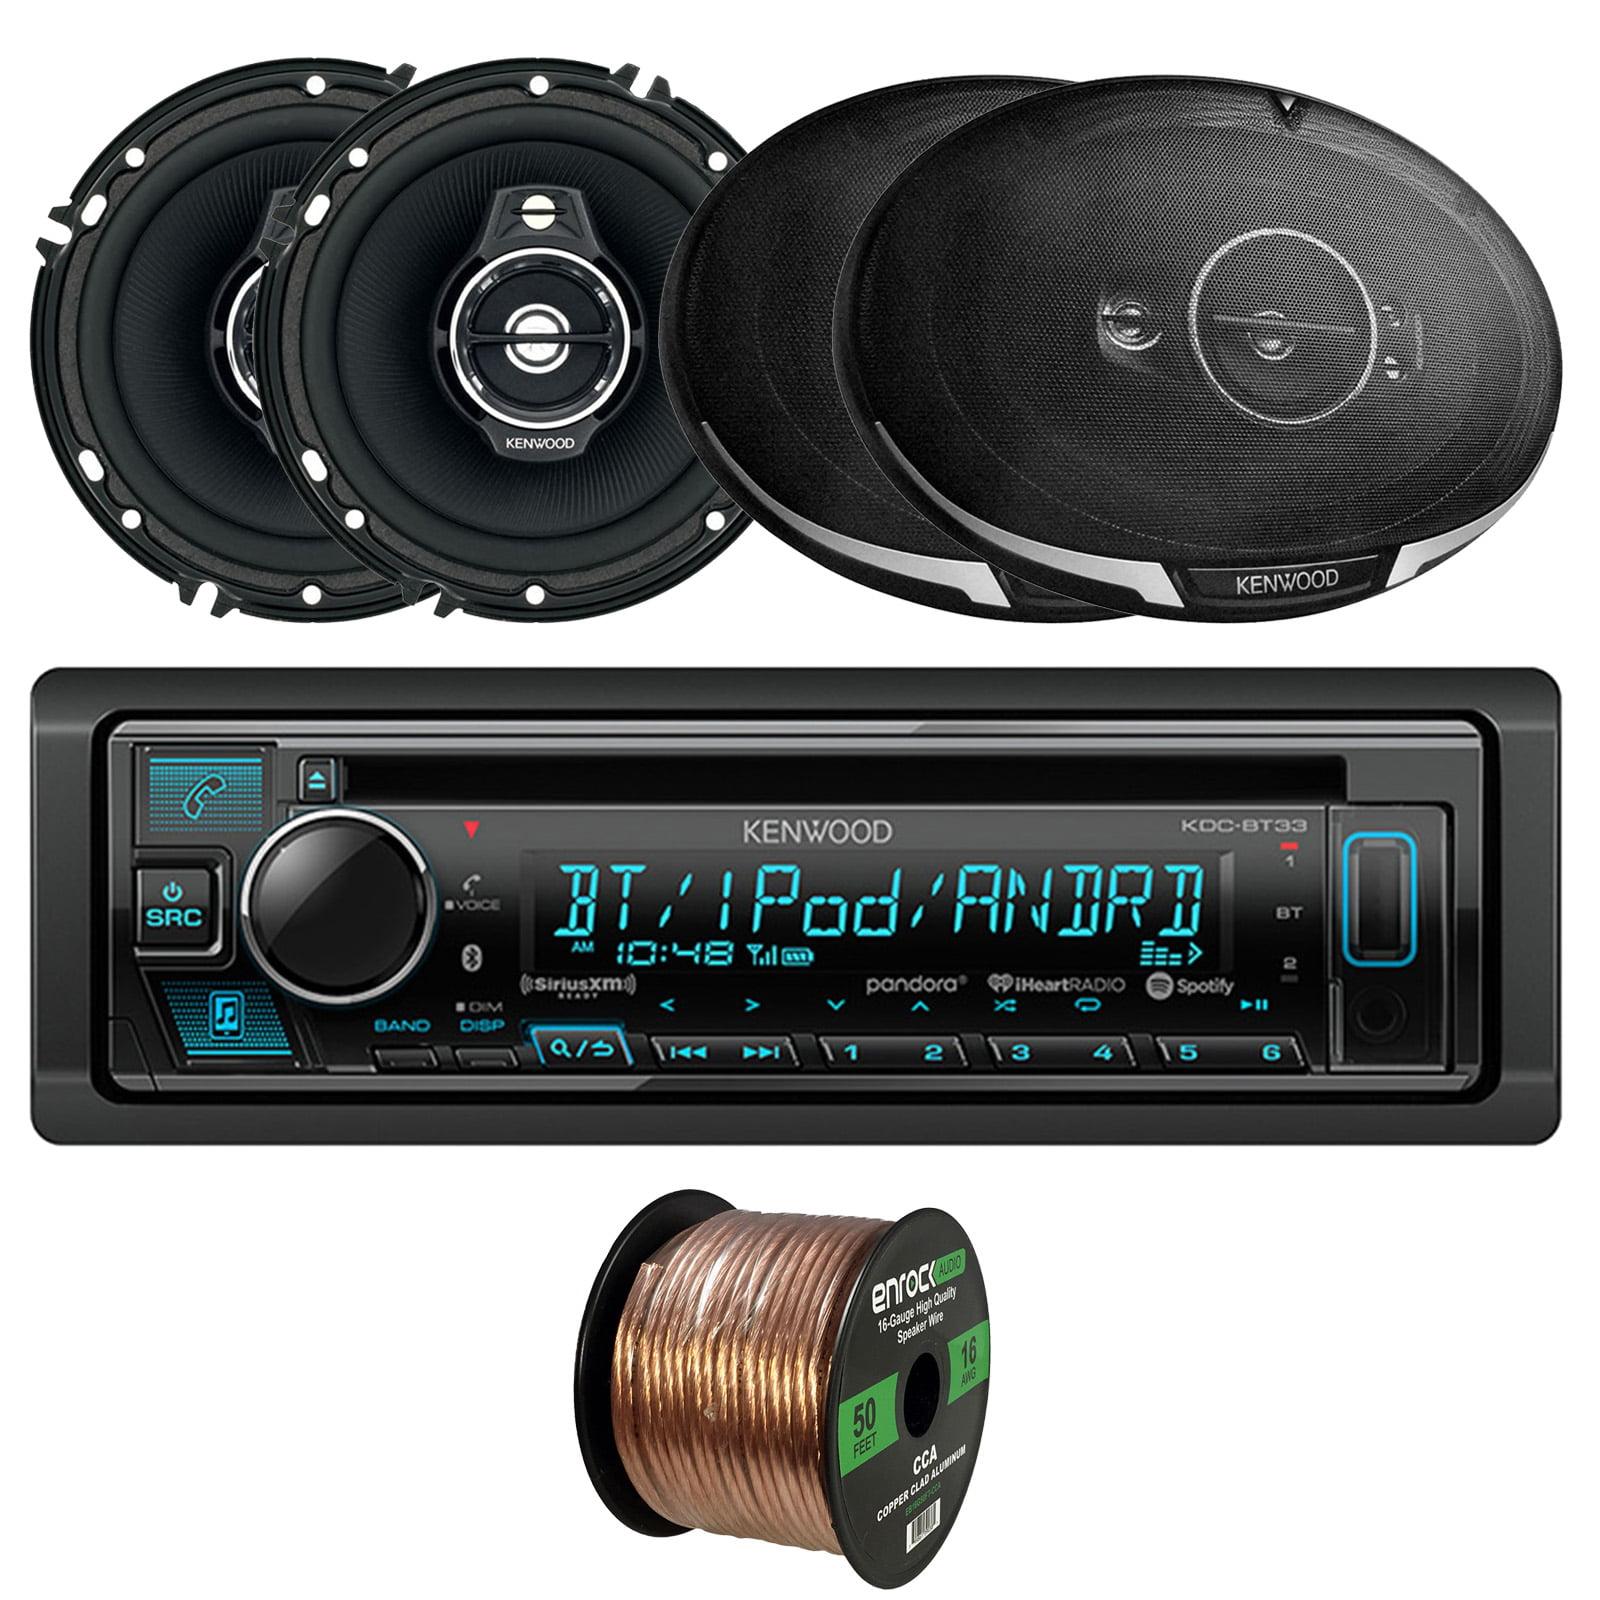 "Kenwood KDC-BT33 Single-DIN In-Dash CD/Bluetooth Receiver, 2 x Kenwood KFC-1695PS Performance Series 6.5"" 3-Way Speakers, 2 x Kenwood 6x9"" 5-Way Speakers, 16-Gauge Speaker Wire"